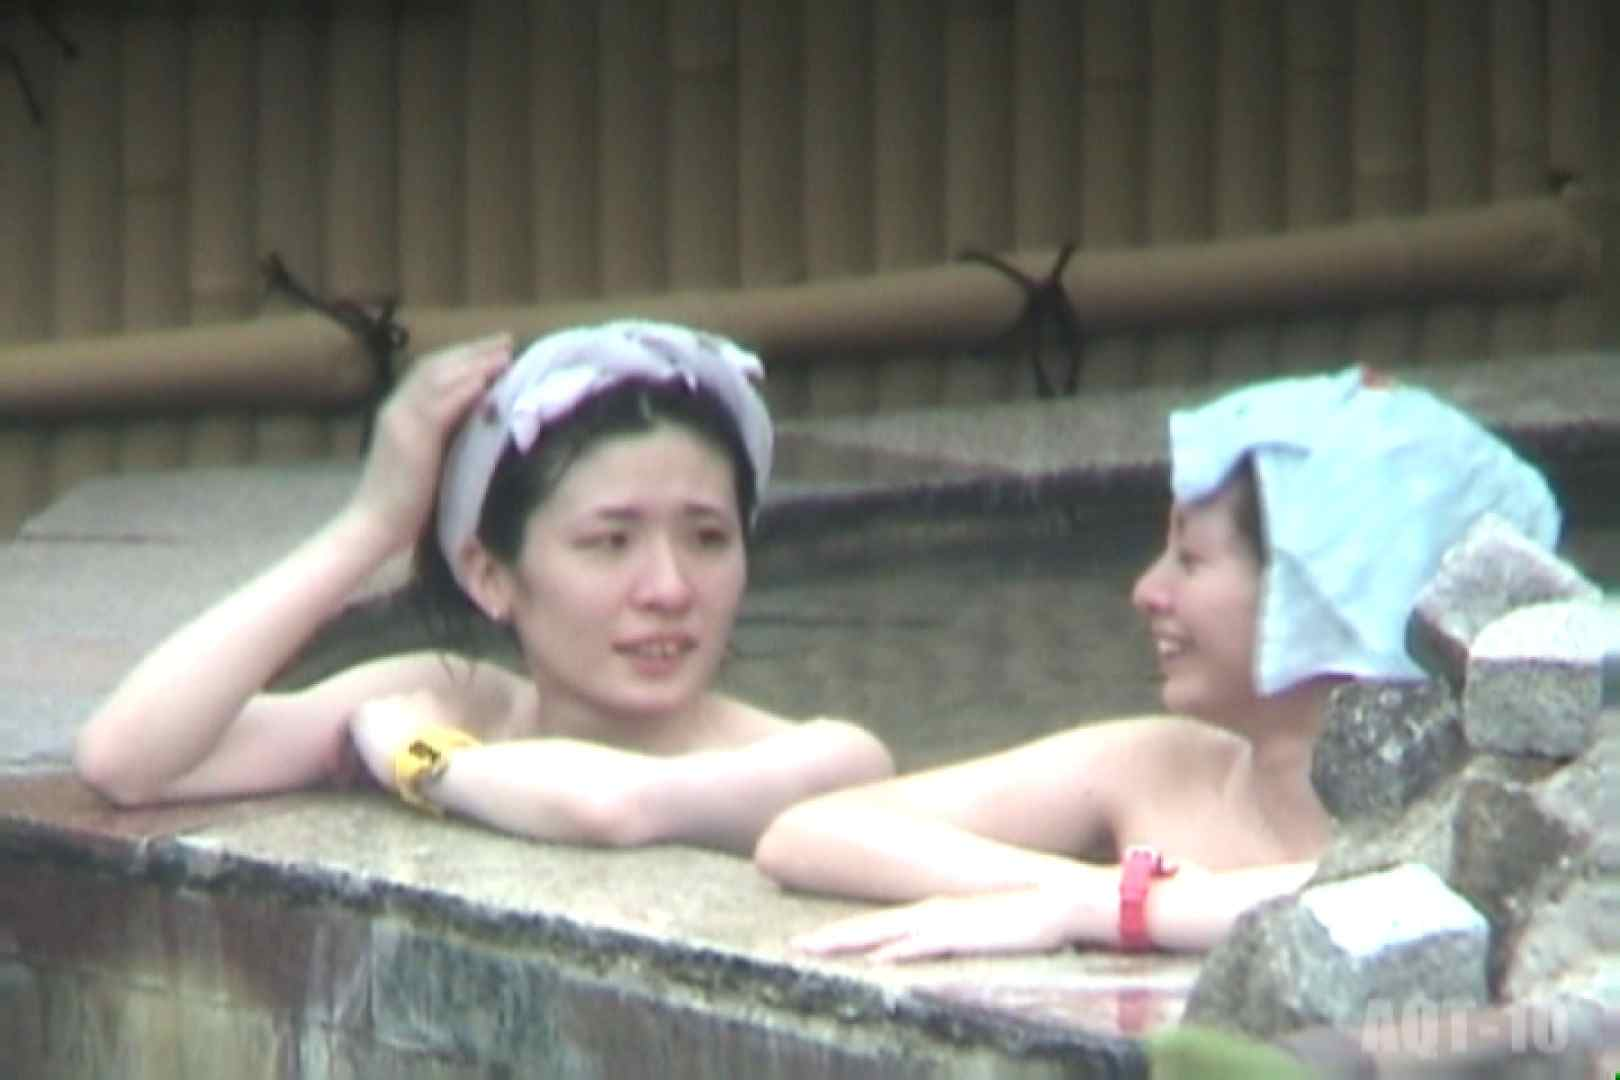 Aquaな露天風呂Vol.793 盗撮映像  72Pix 29